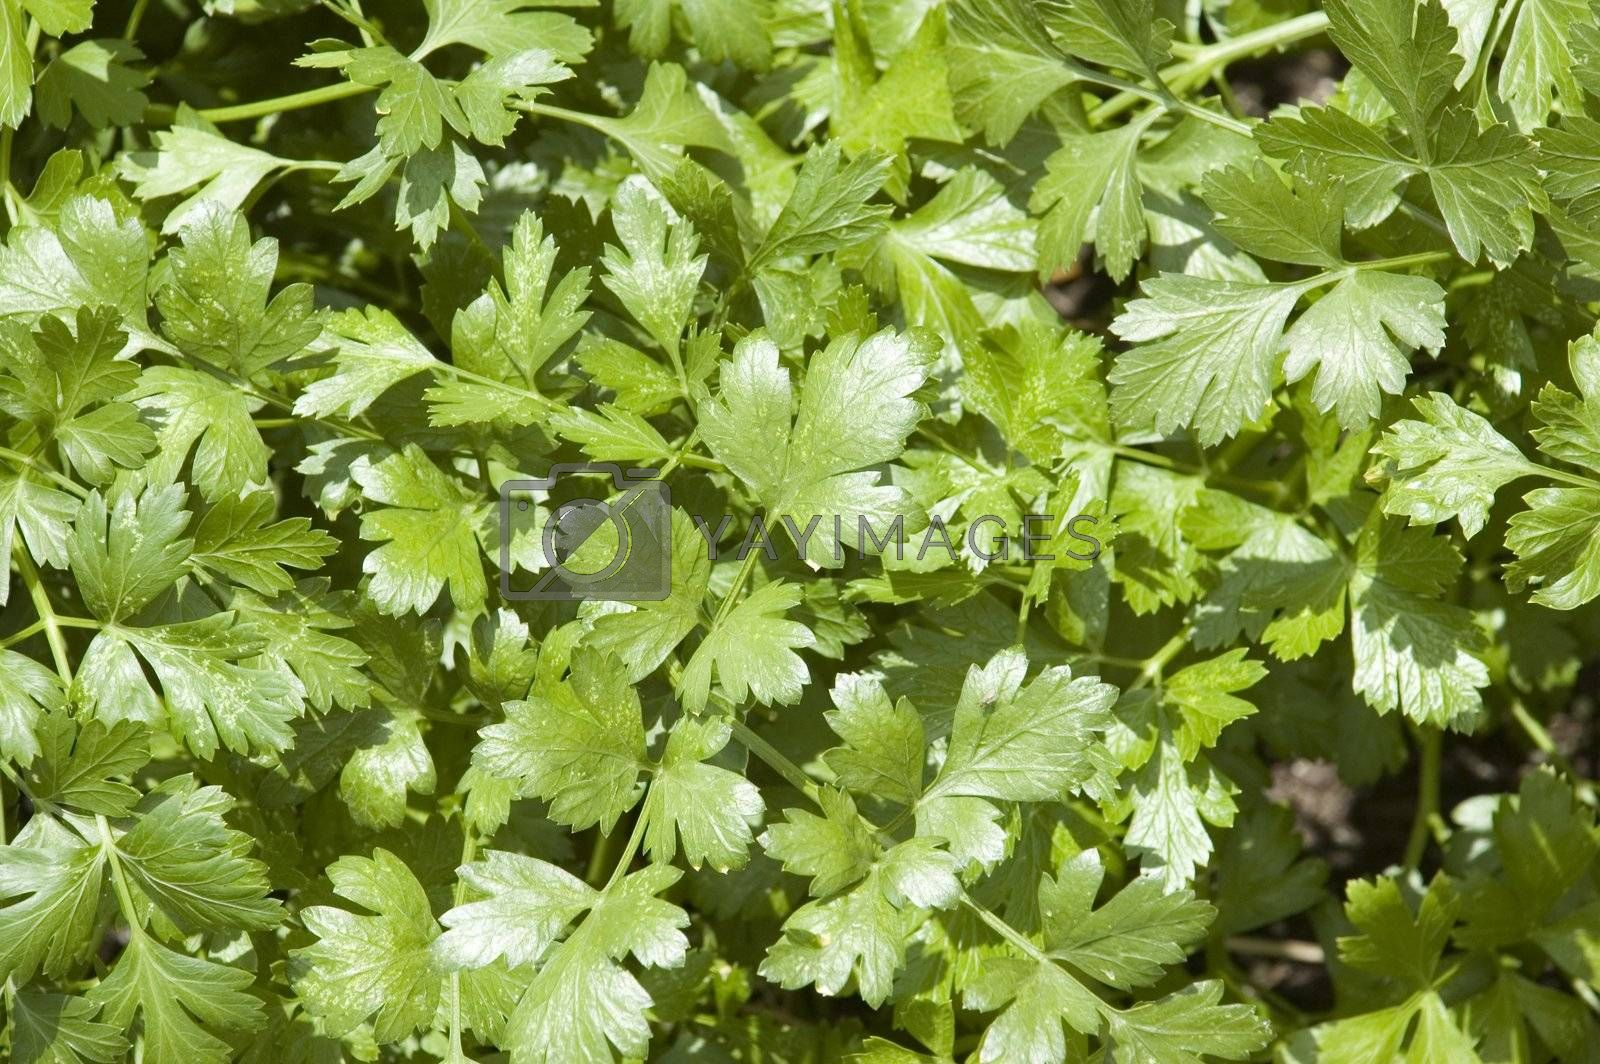 Cilantro Herb Leaves by suwanneeredhead